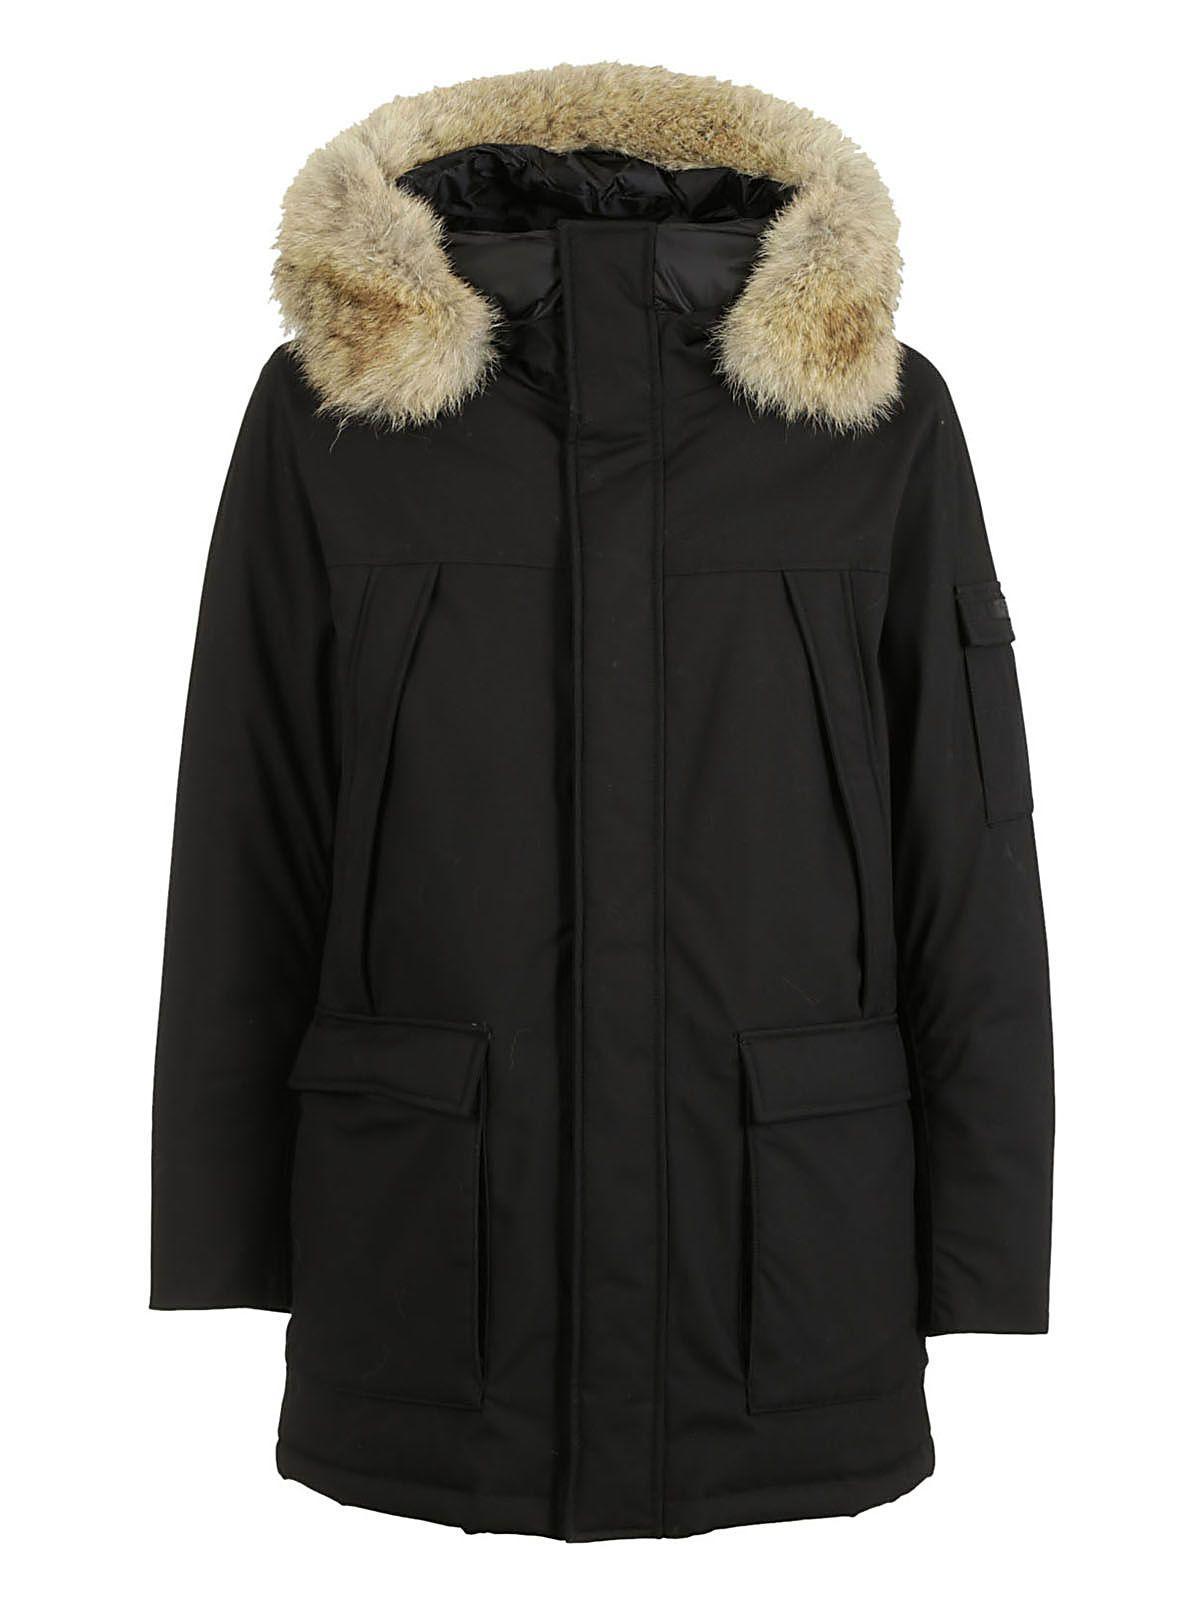 Woolrich Fur Detail Parka In Black